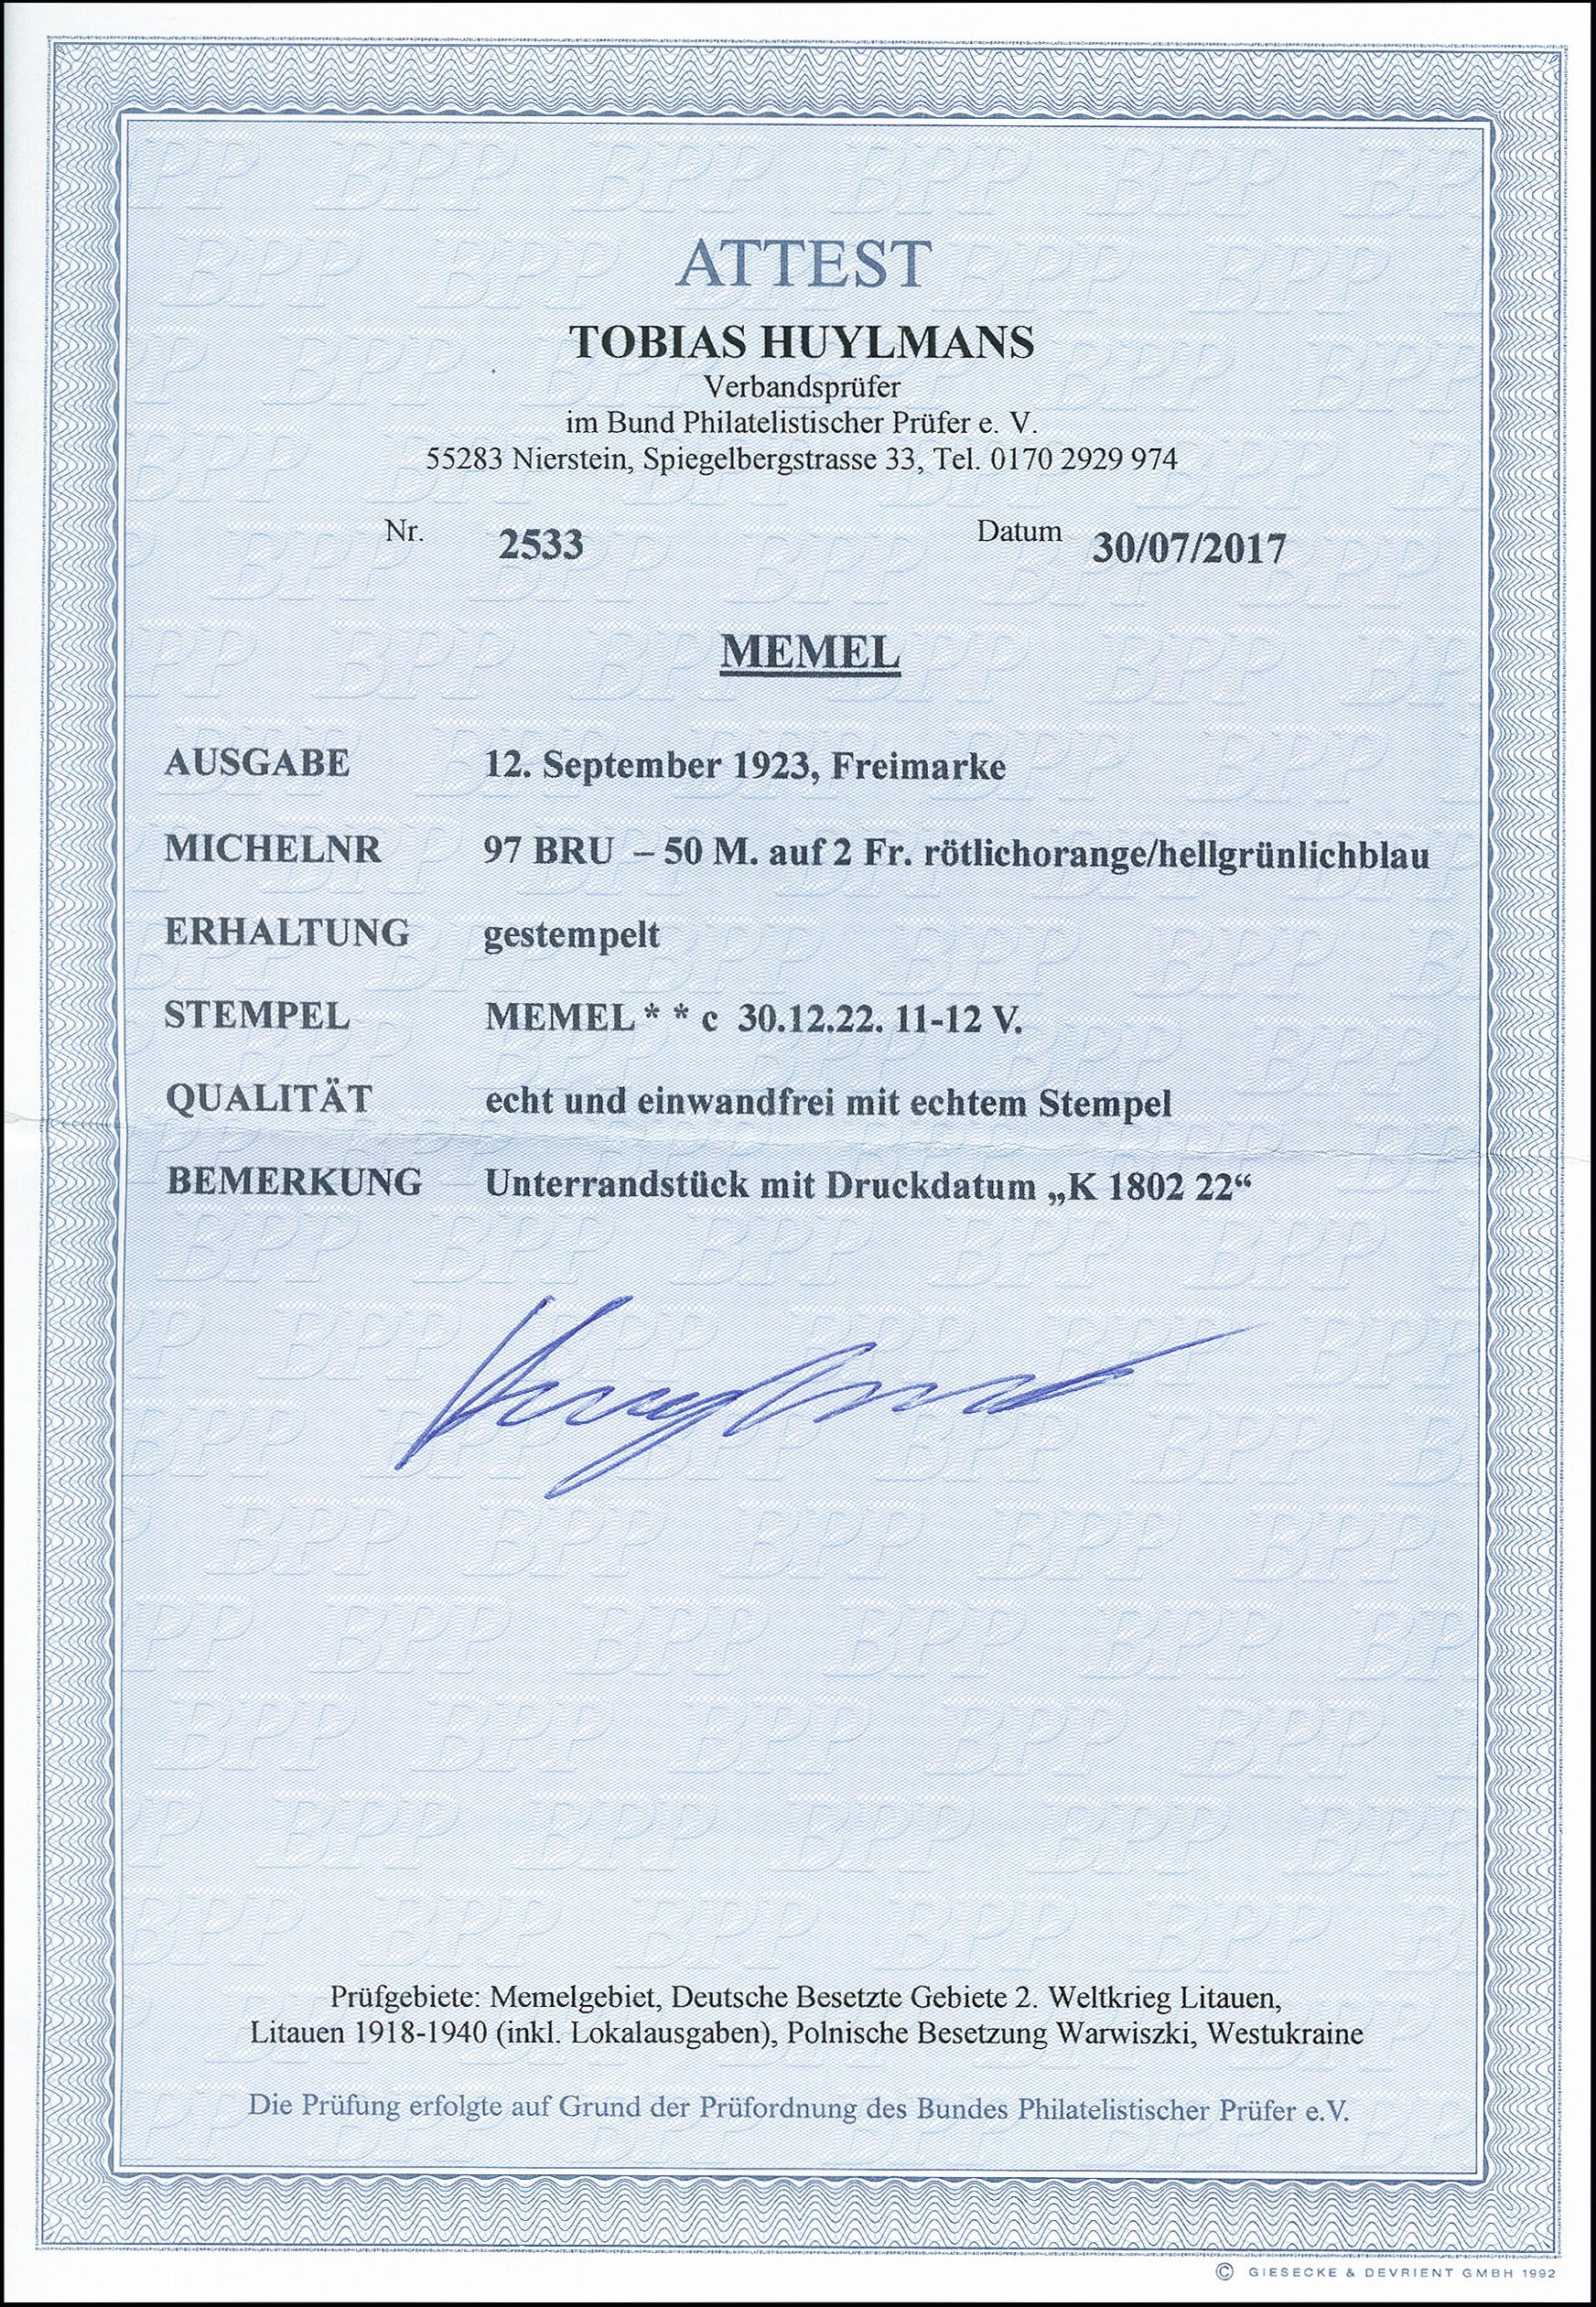 Printtoo GESCANNT Selbstf/ärber Stempel B/üro station/är Bedrucktes Stamp-Blau